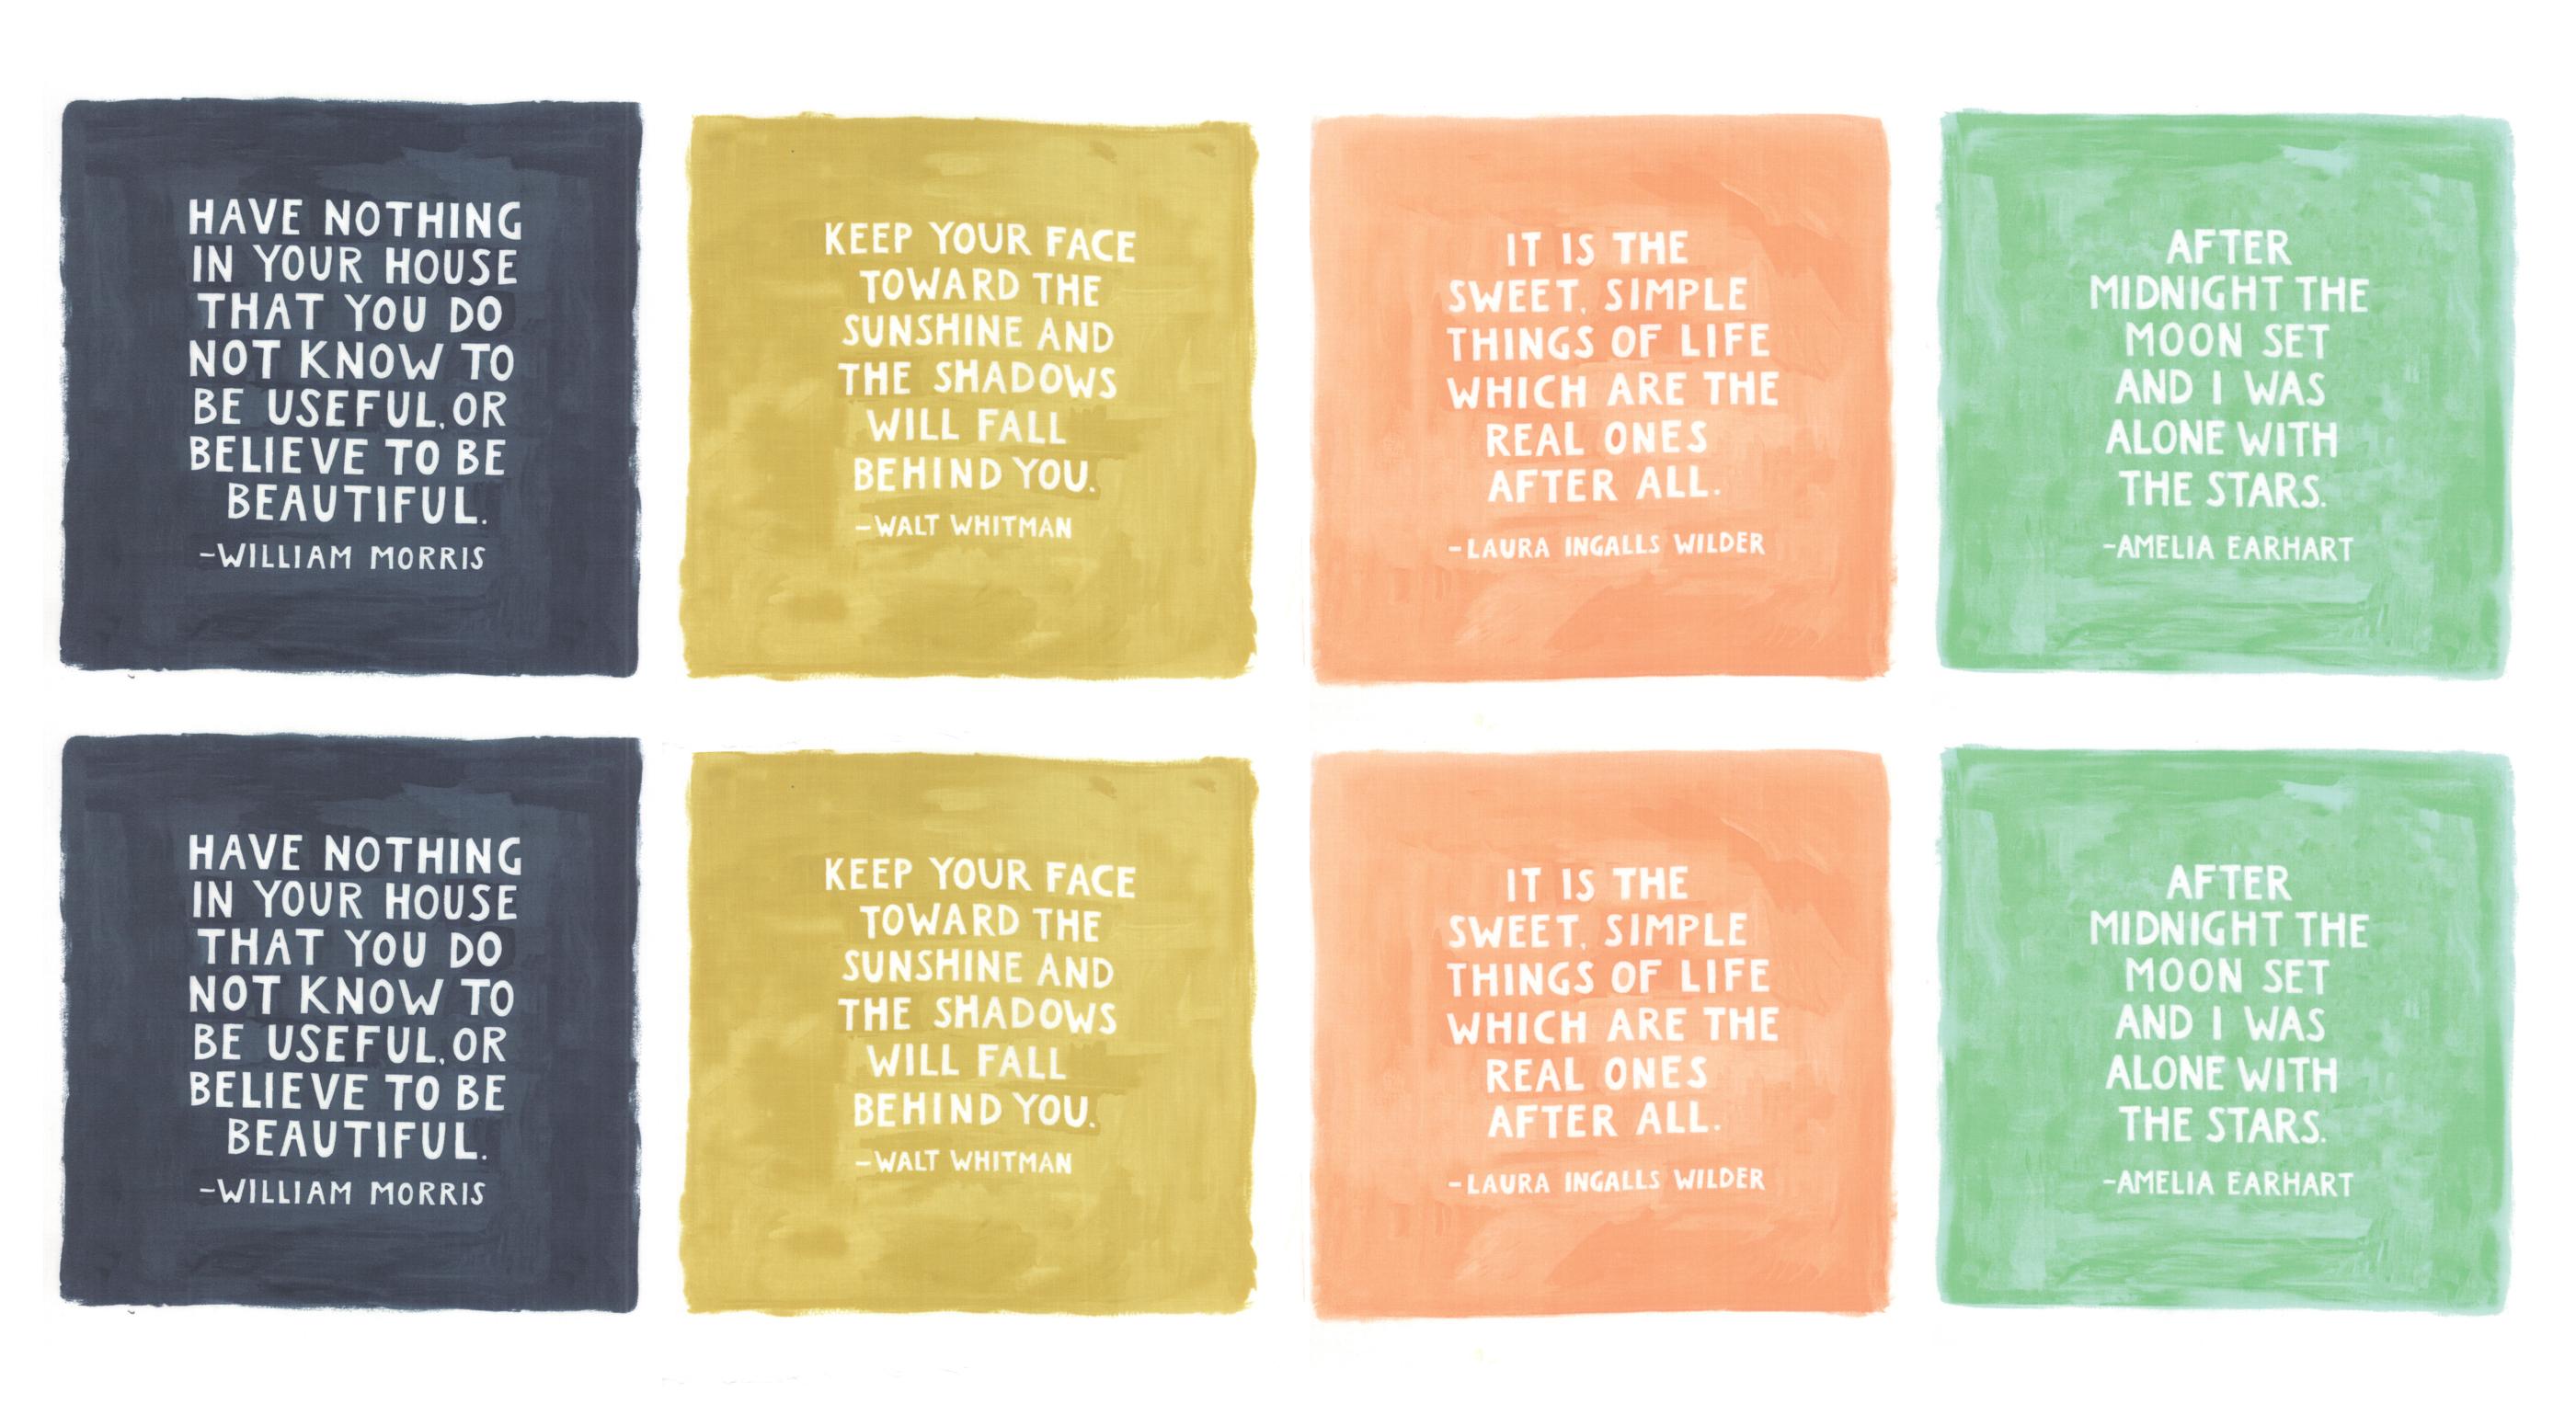 goldenrod 12 x 44 quotes mult